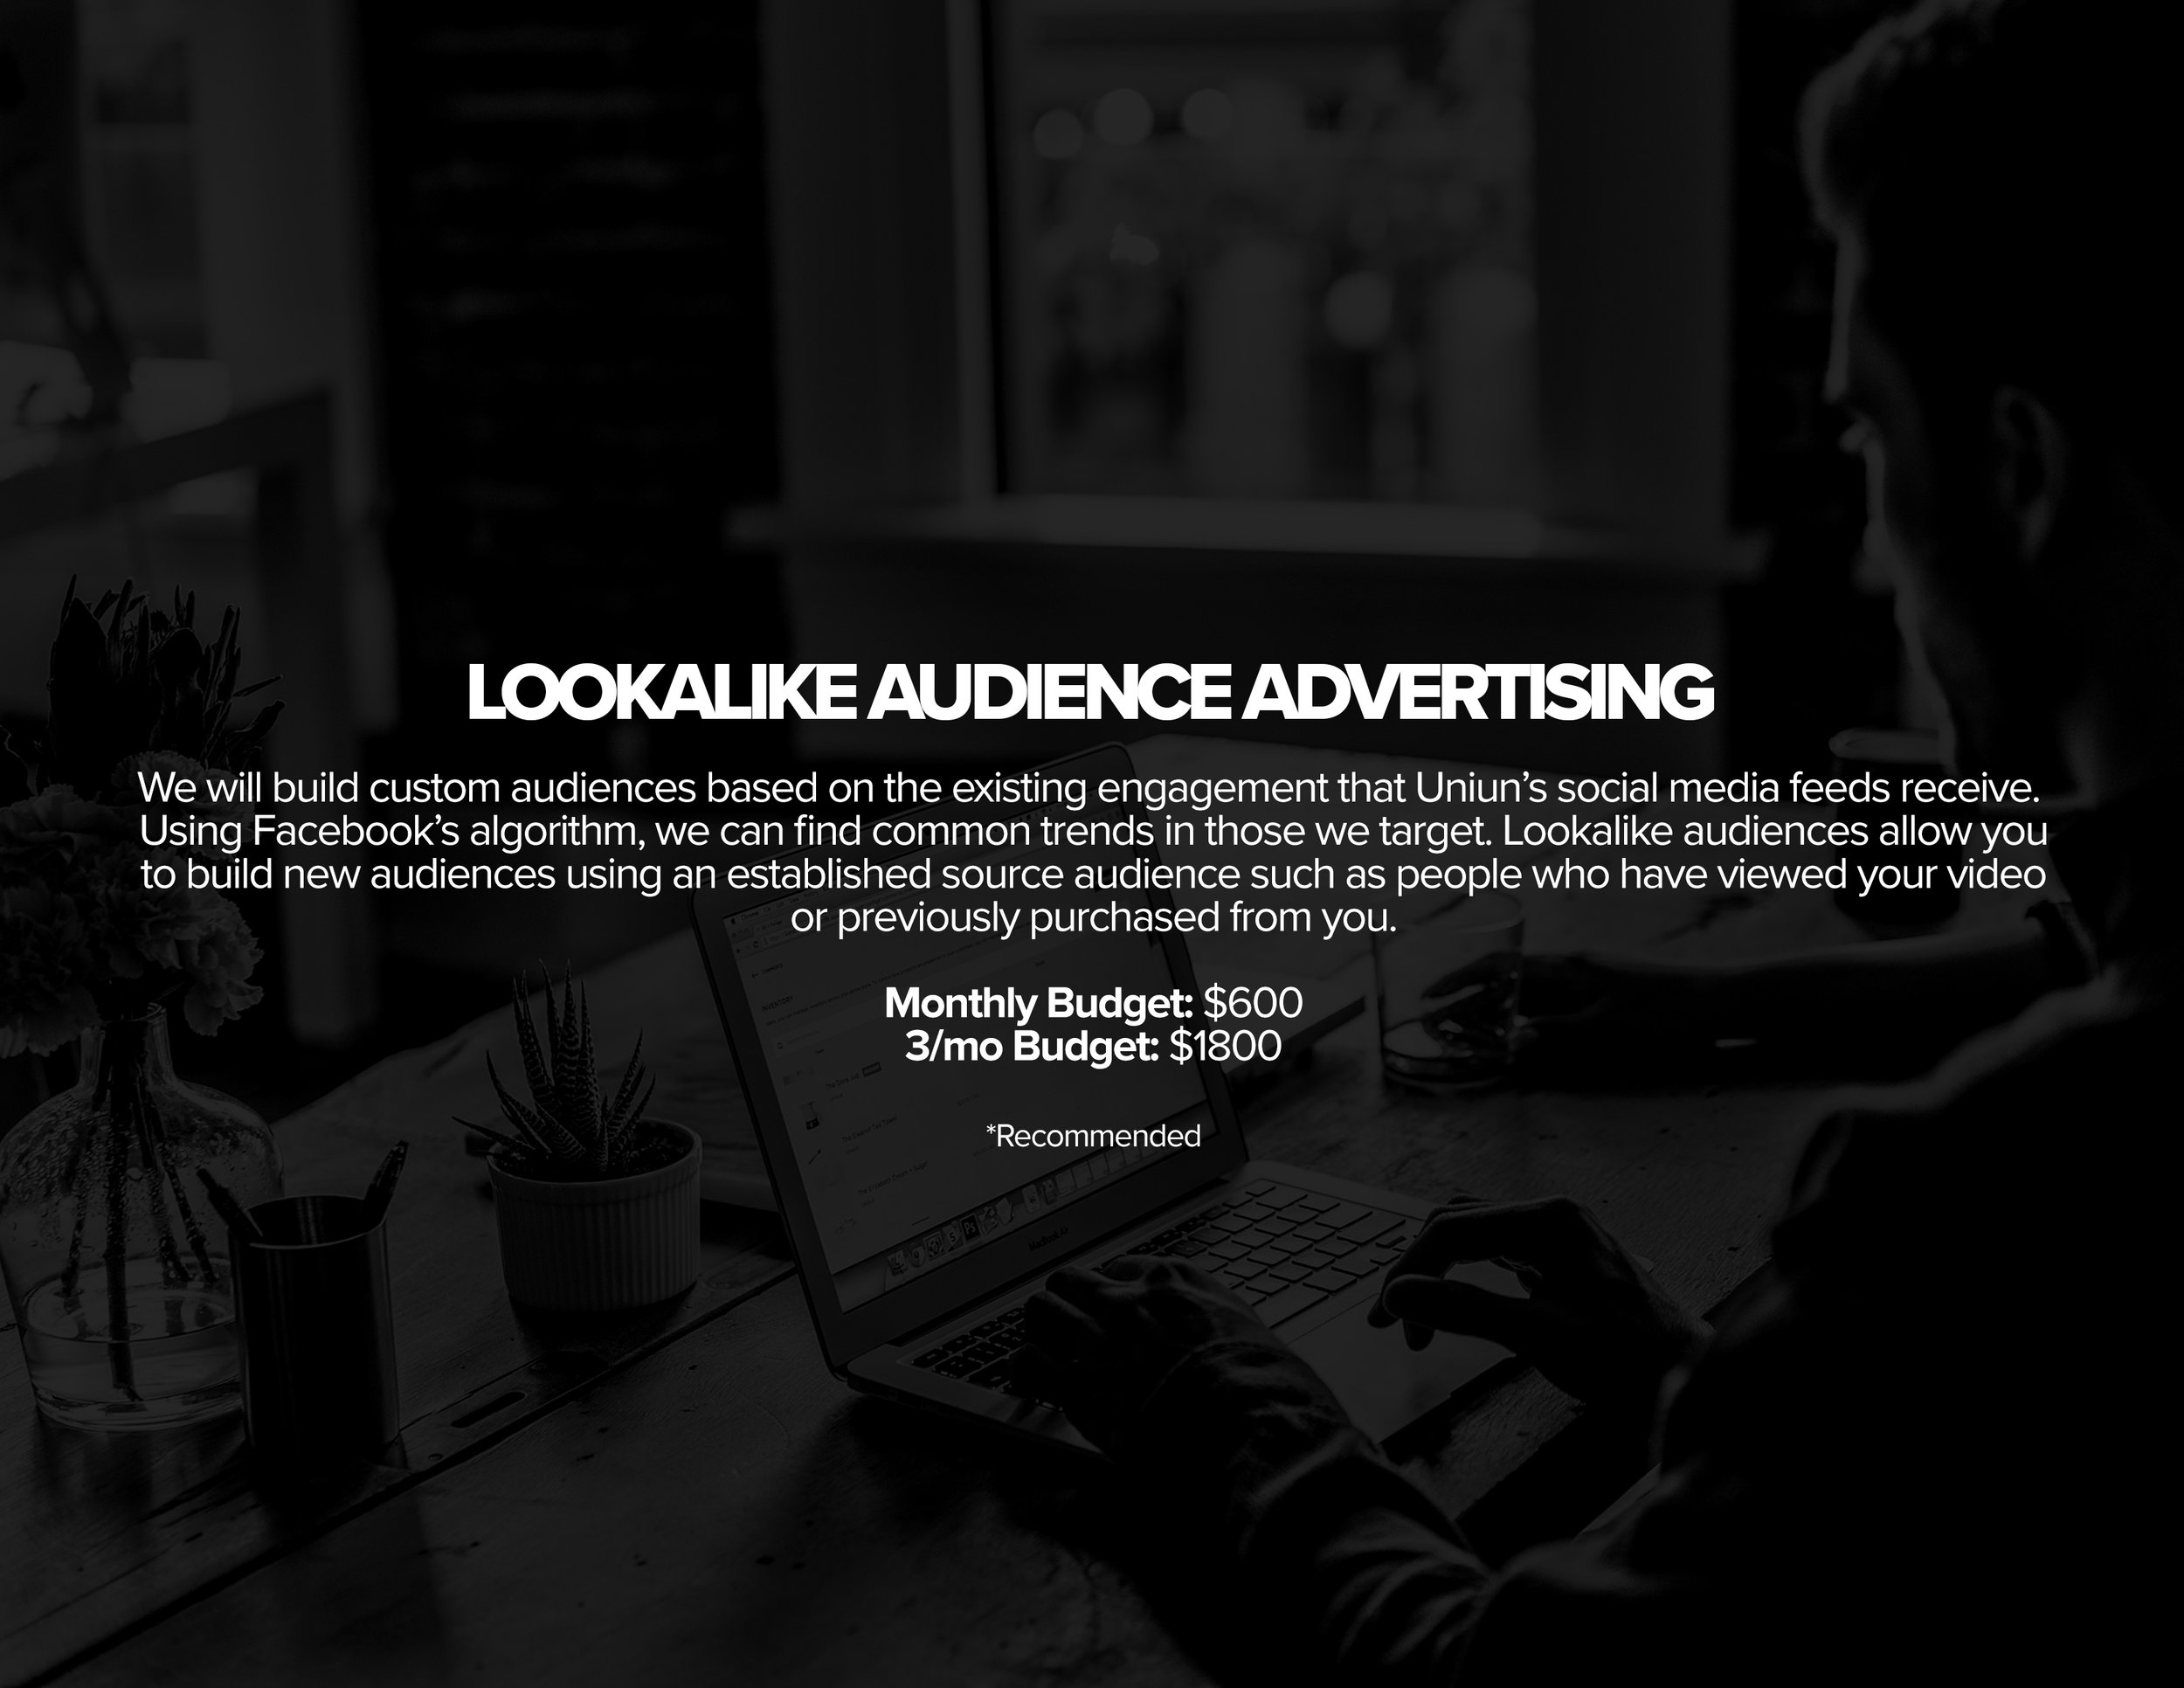 LookalikeAudience_8.5x11.jpg